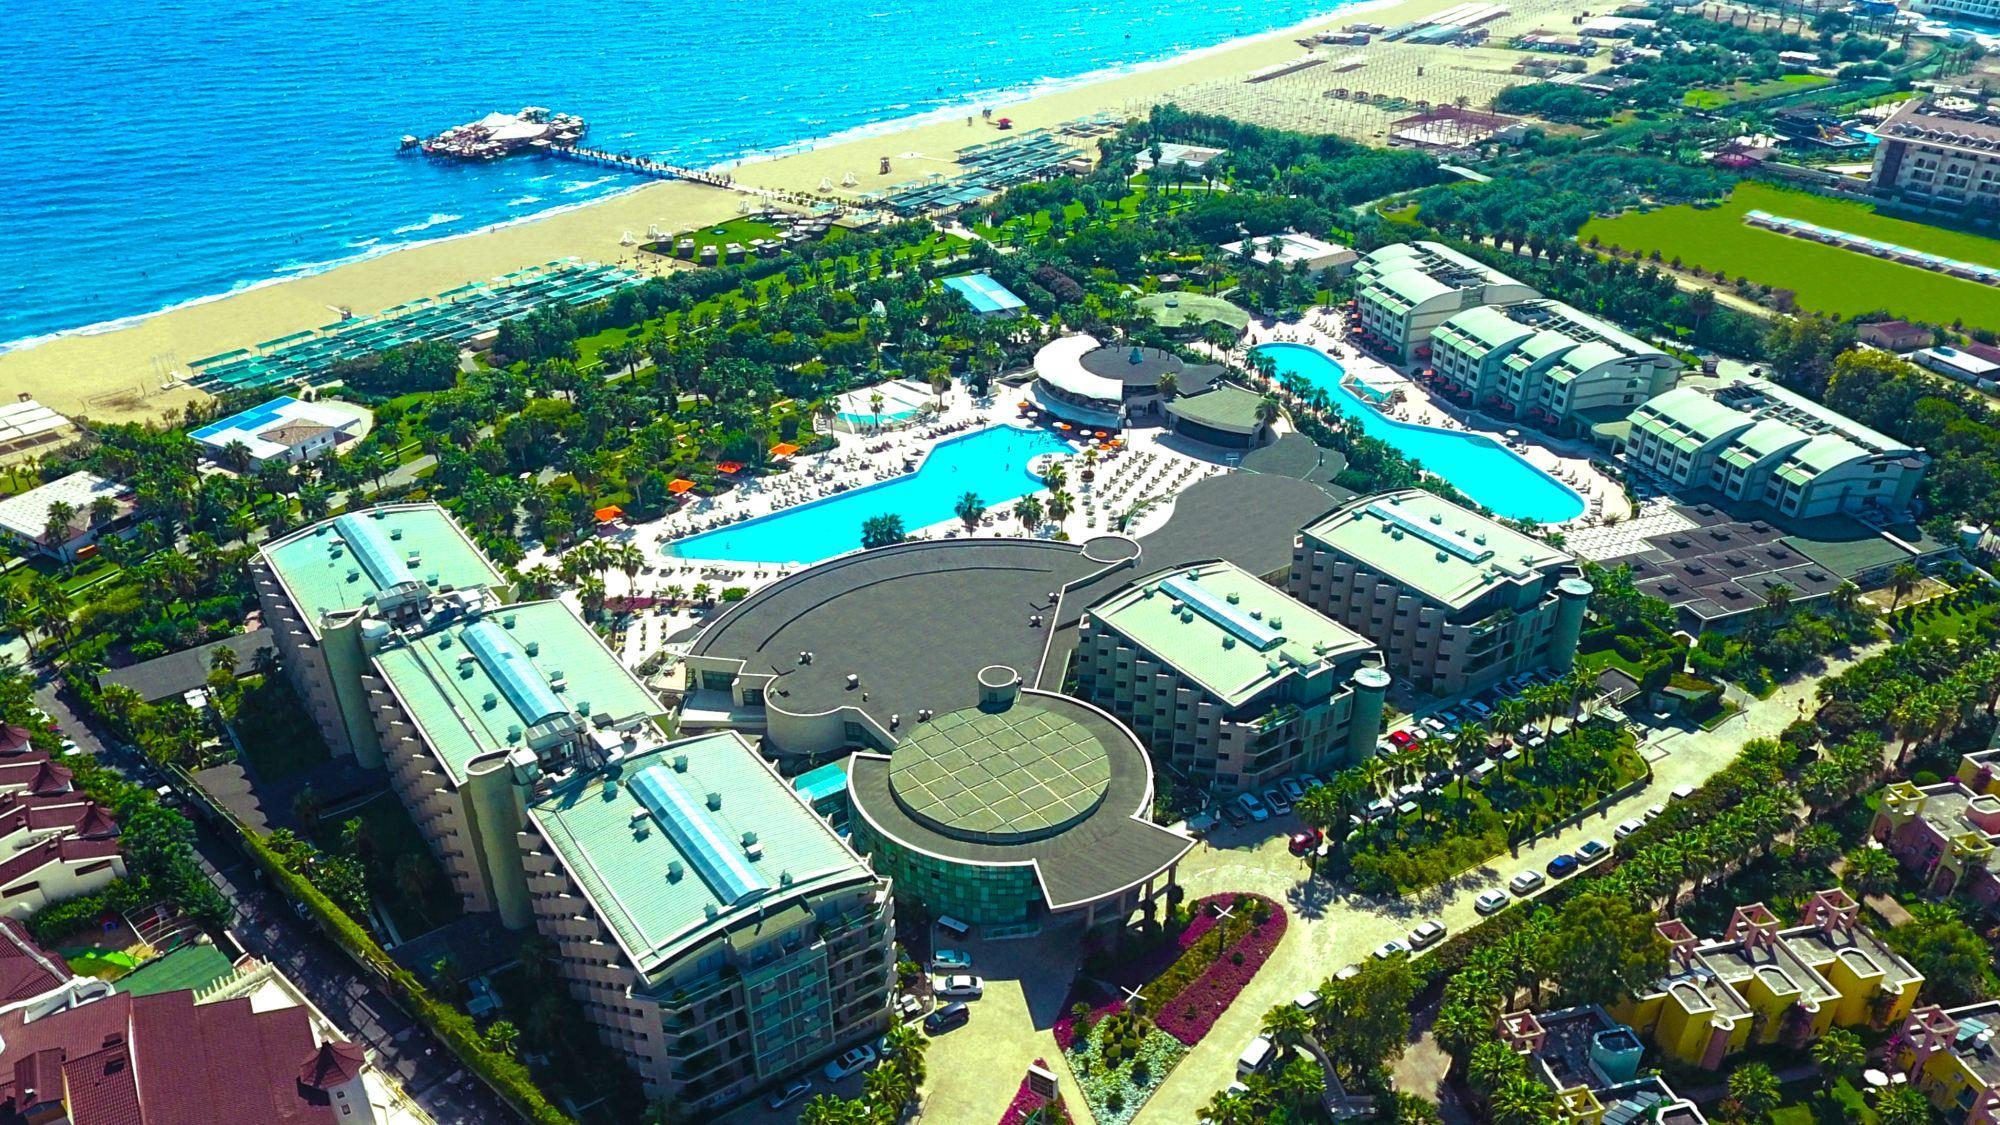 http://www.orextravel.sk/OREX/hotelphotos/vonresort-golden-coast-general-0021.jpg